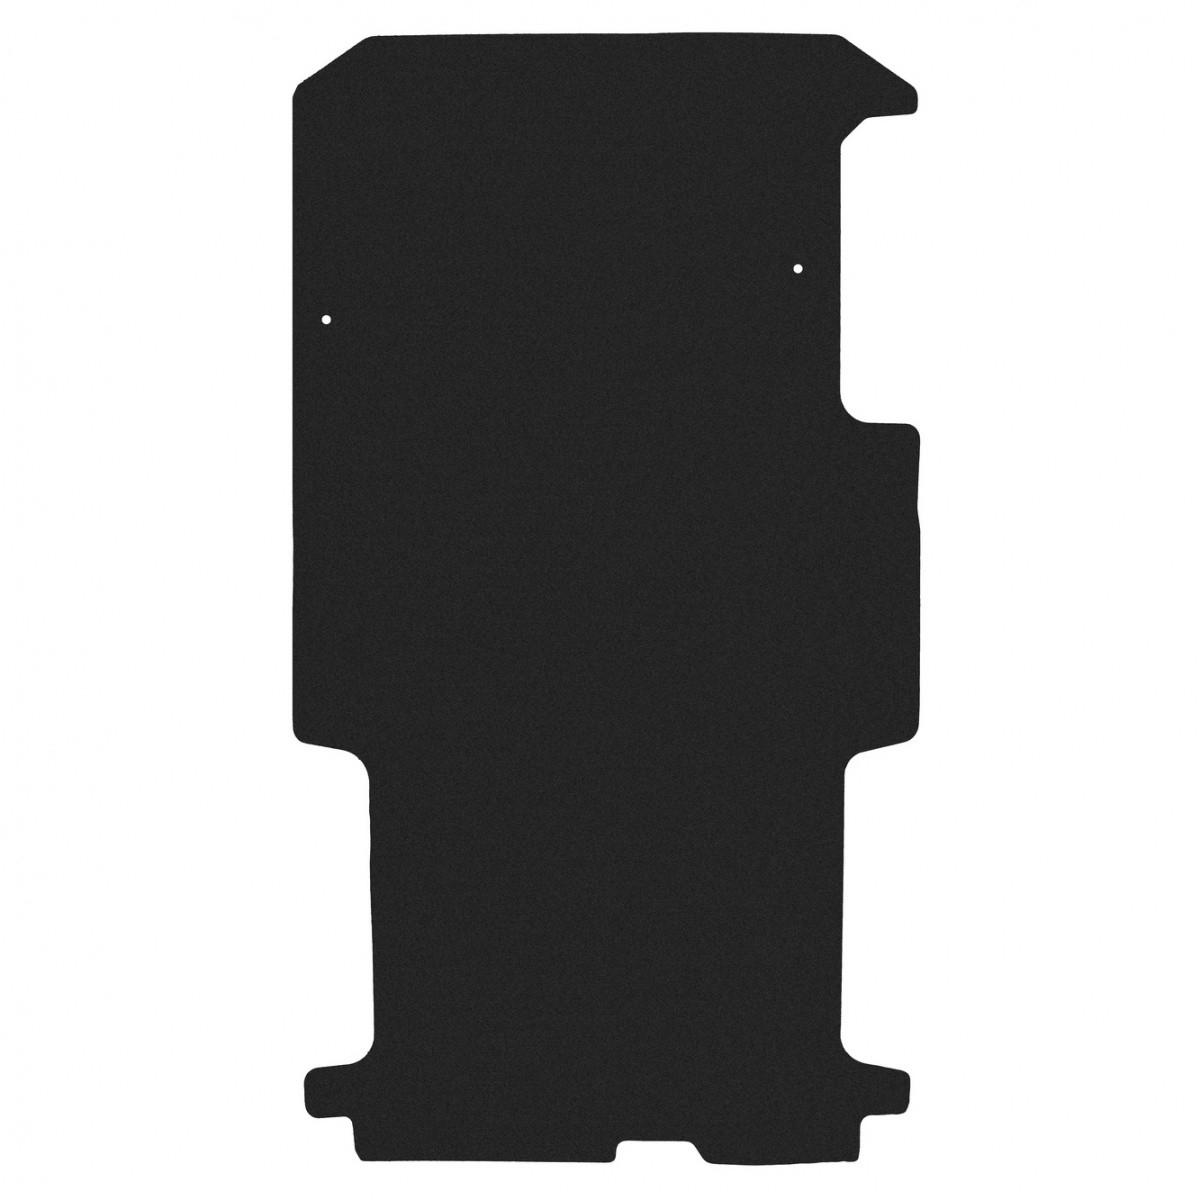 Vložka Renault Trafic 2001-2014 (L2-long)